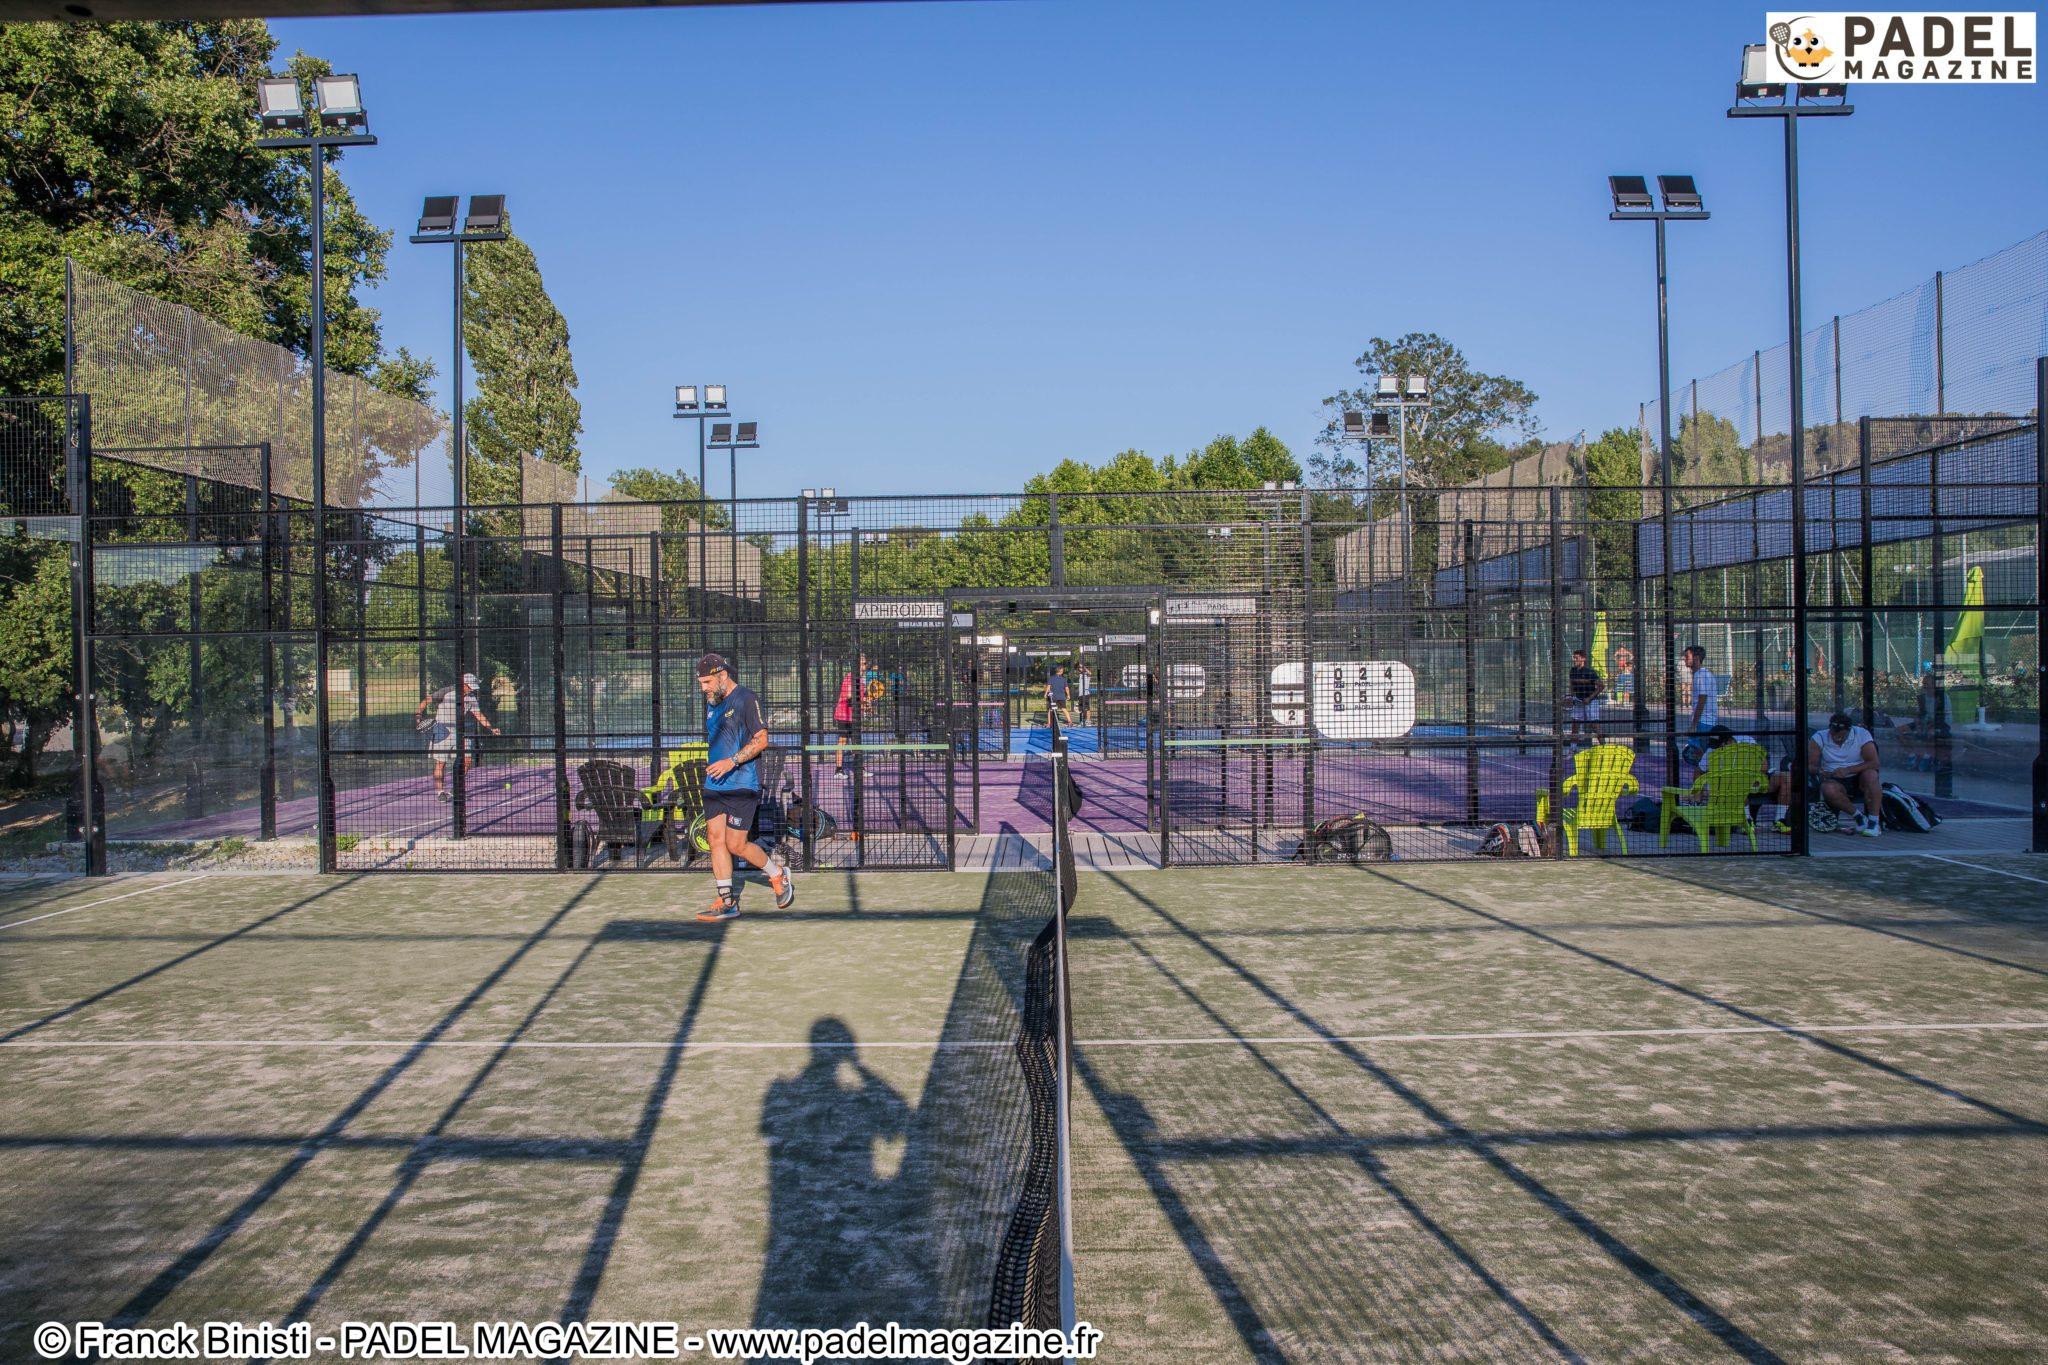 1 / 2-Salines / Mendez vs Decarli / Casal-オープンオールイン Padel スポーツ-P1000